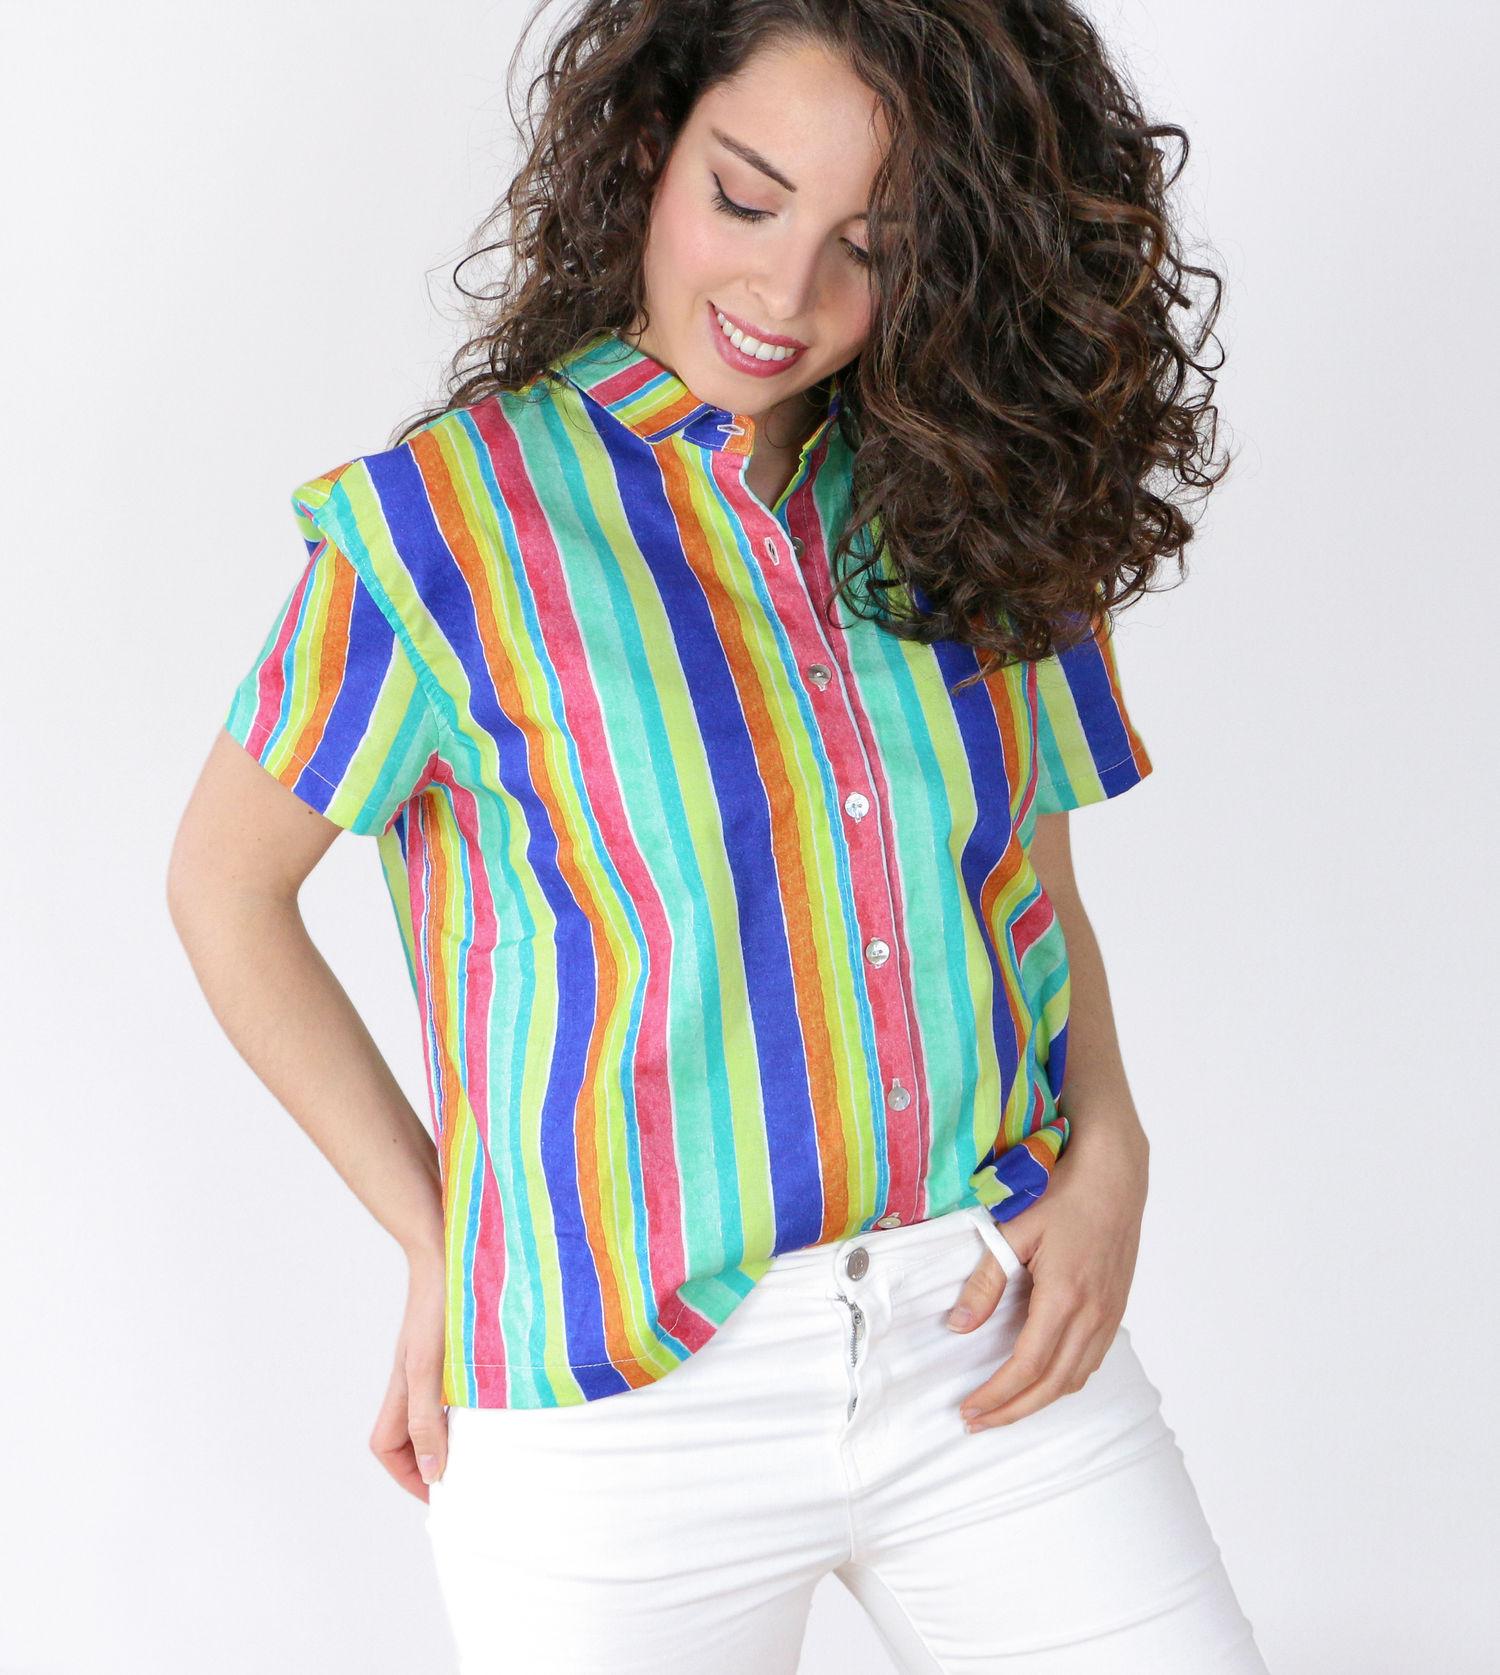 camisa_rayas_delantero.jpg